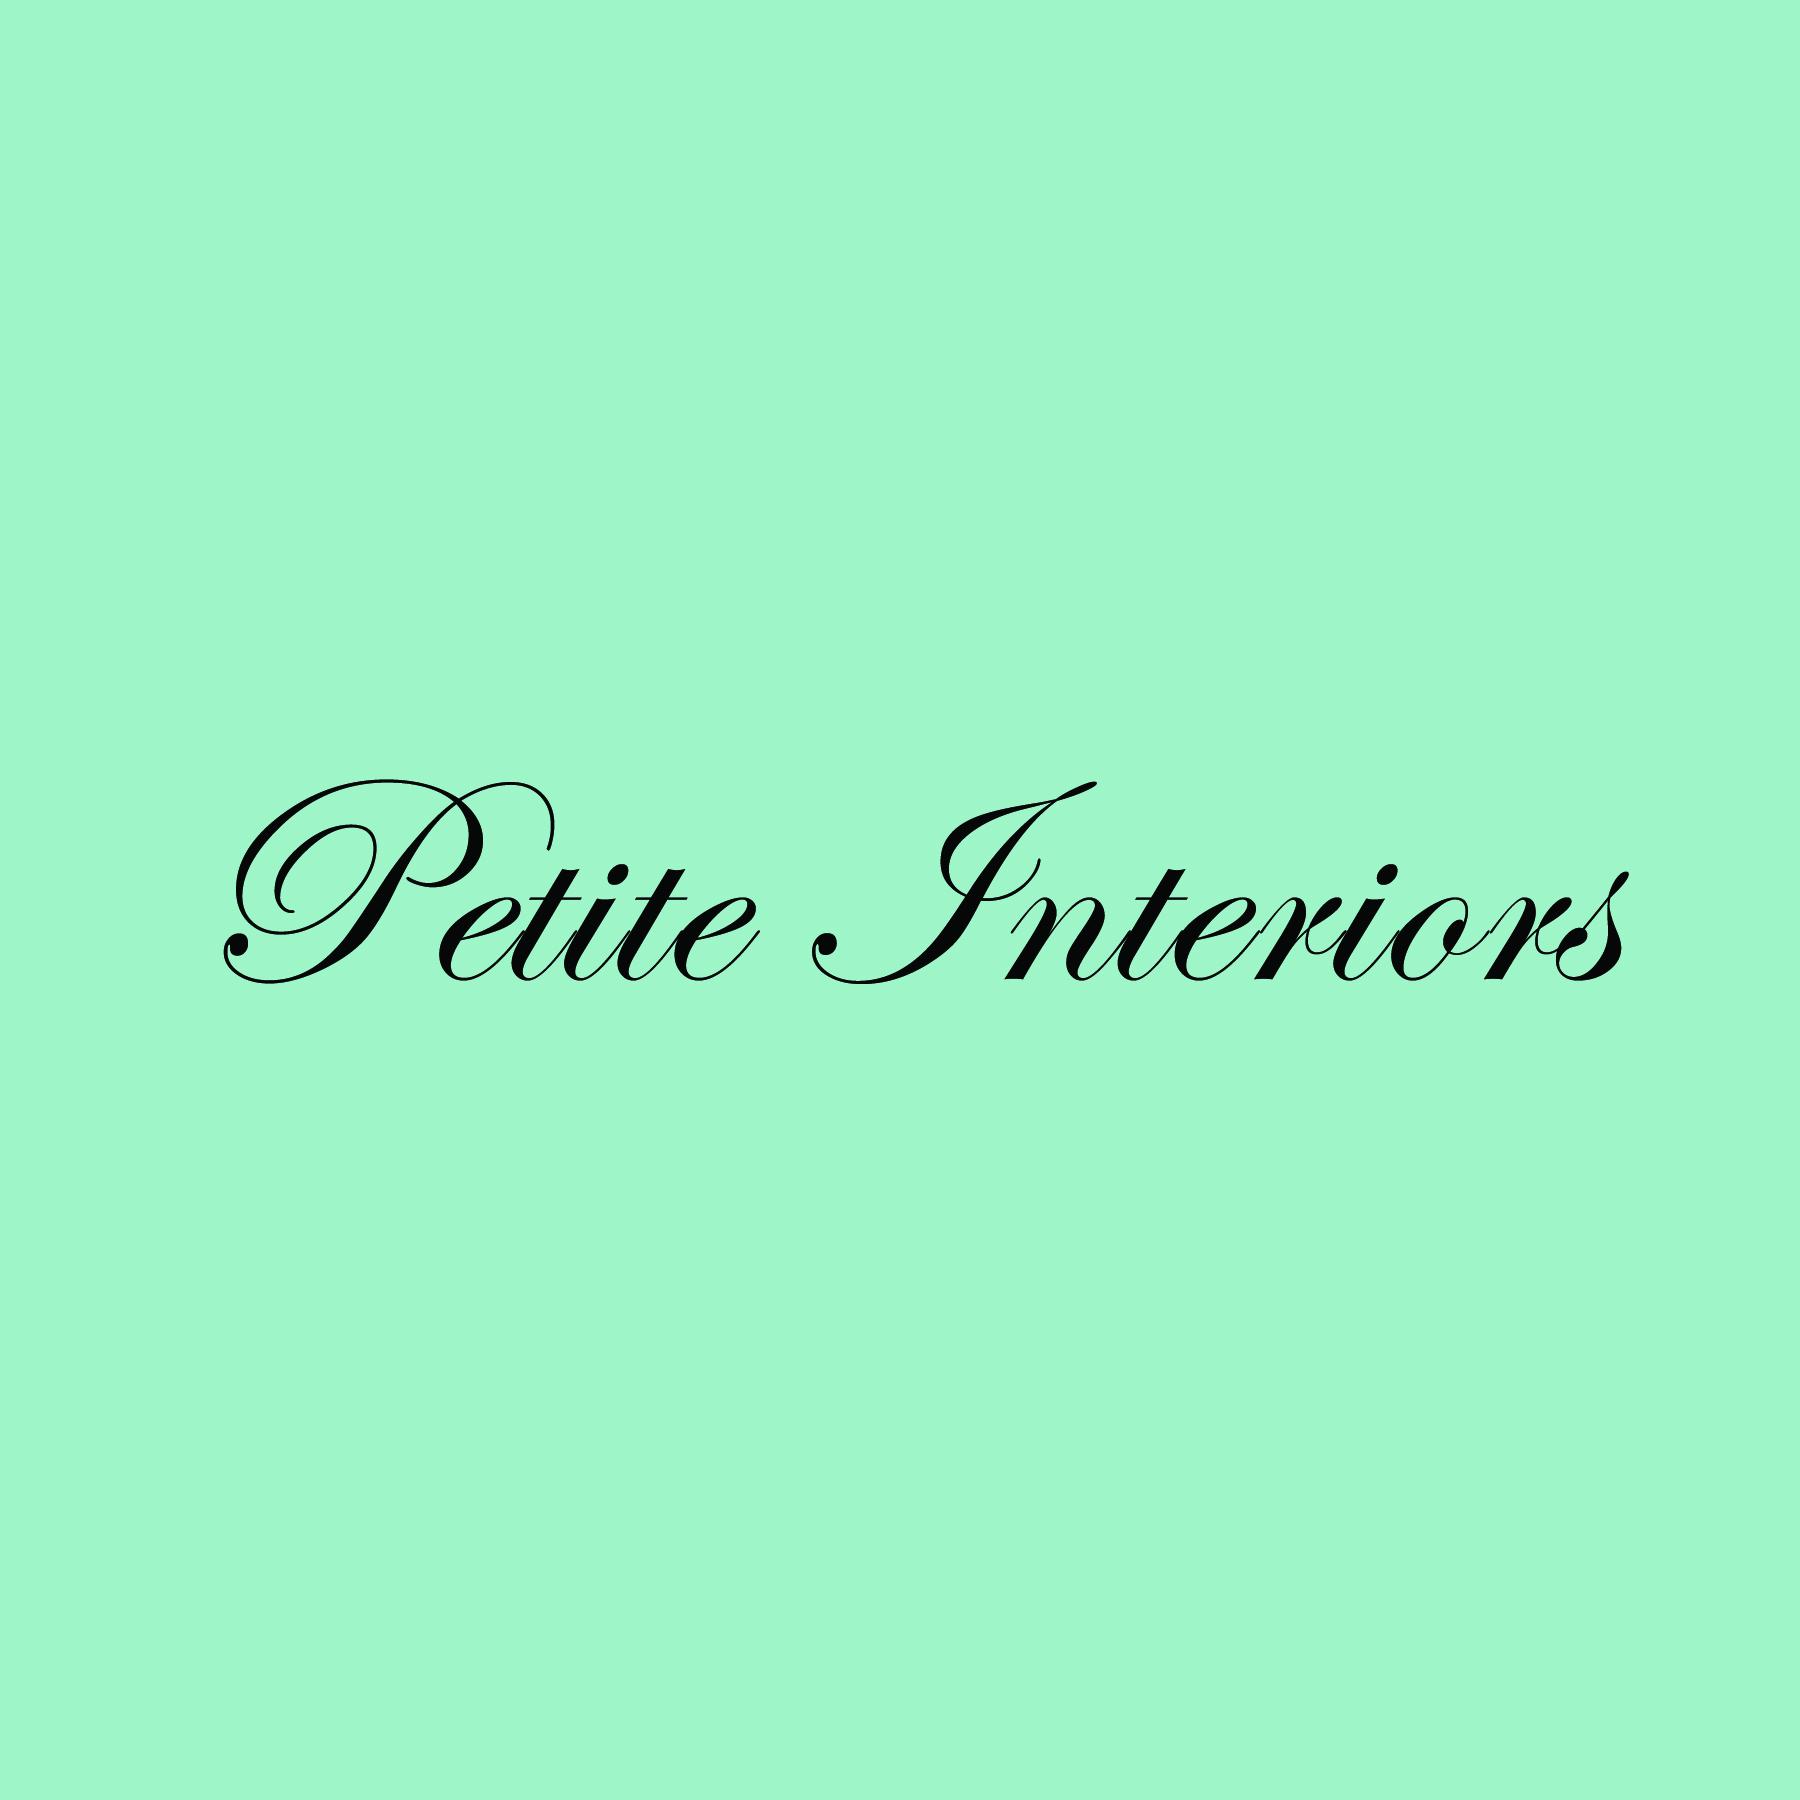 Petite Interiors.jpg